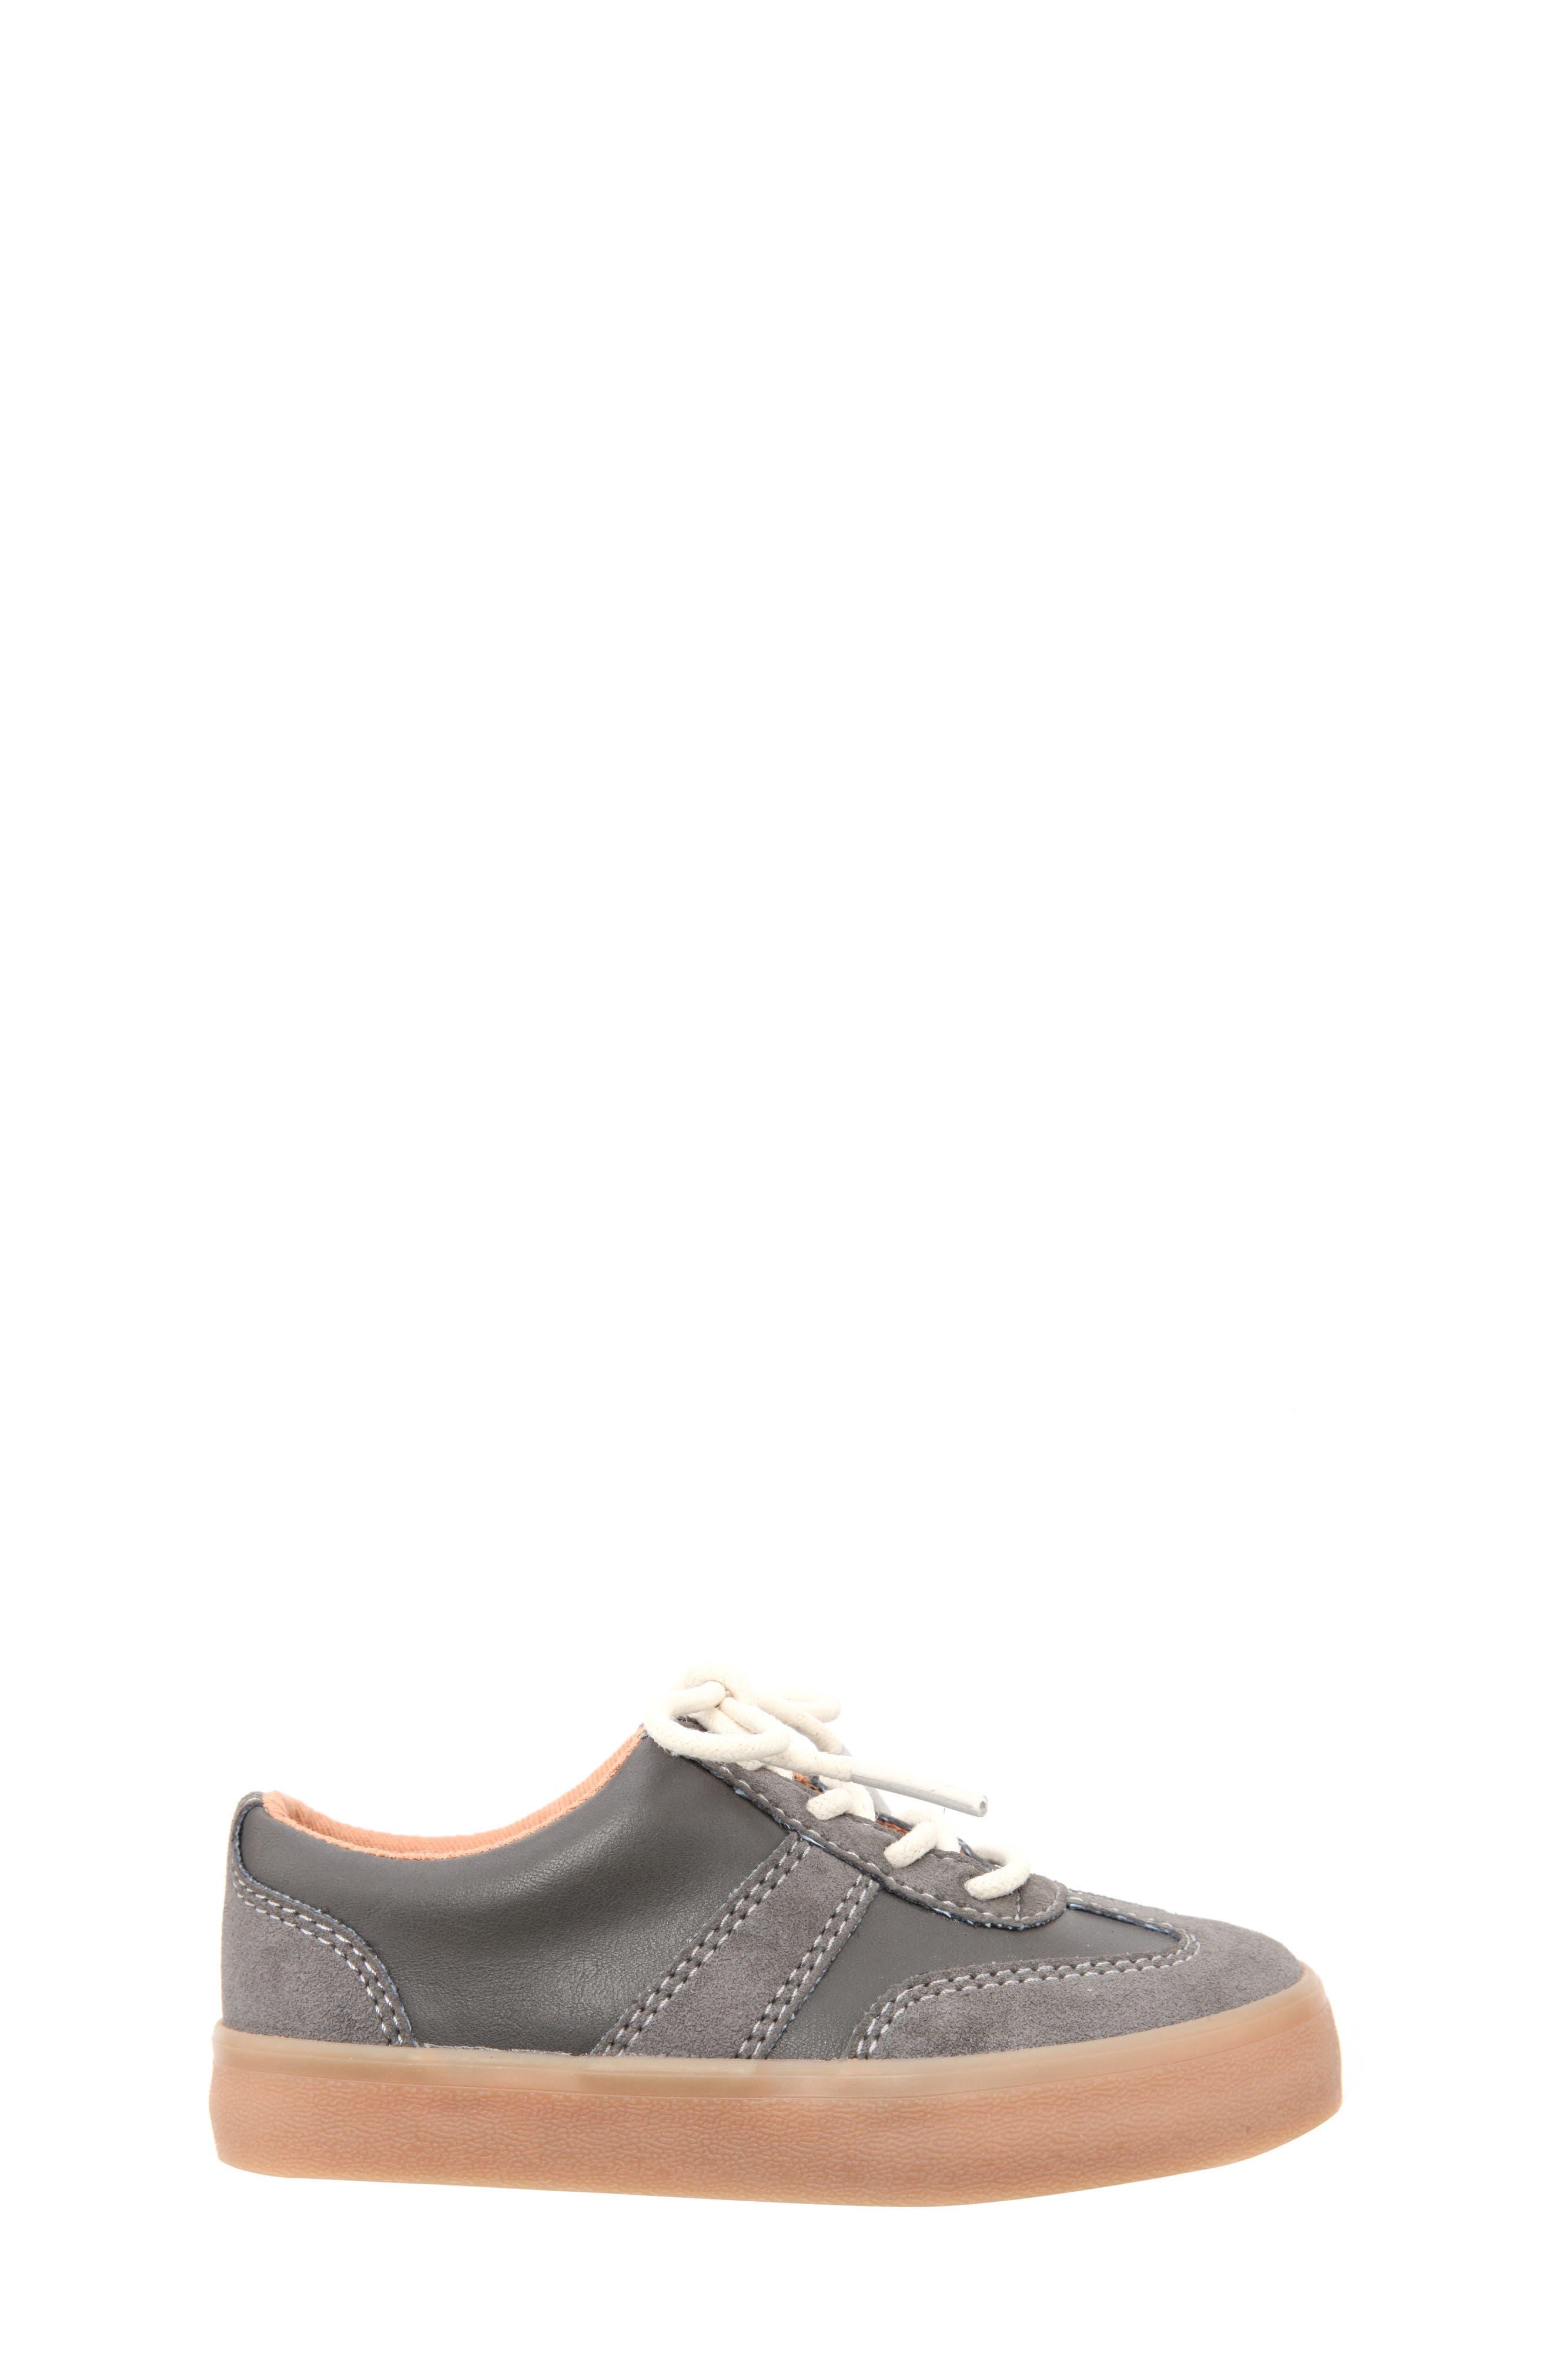 Neal Low Top Sneaker,                             Alternate thumbnail 3, color,                             Grey Suede